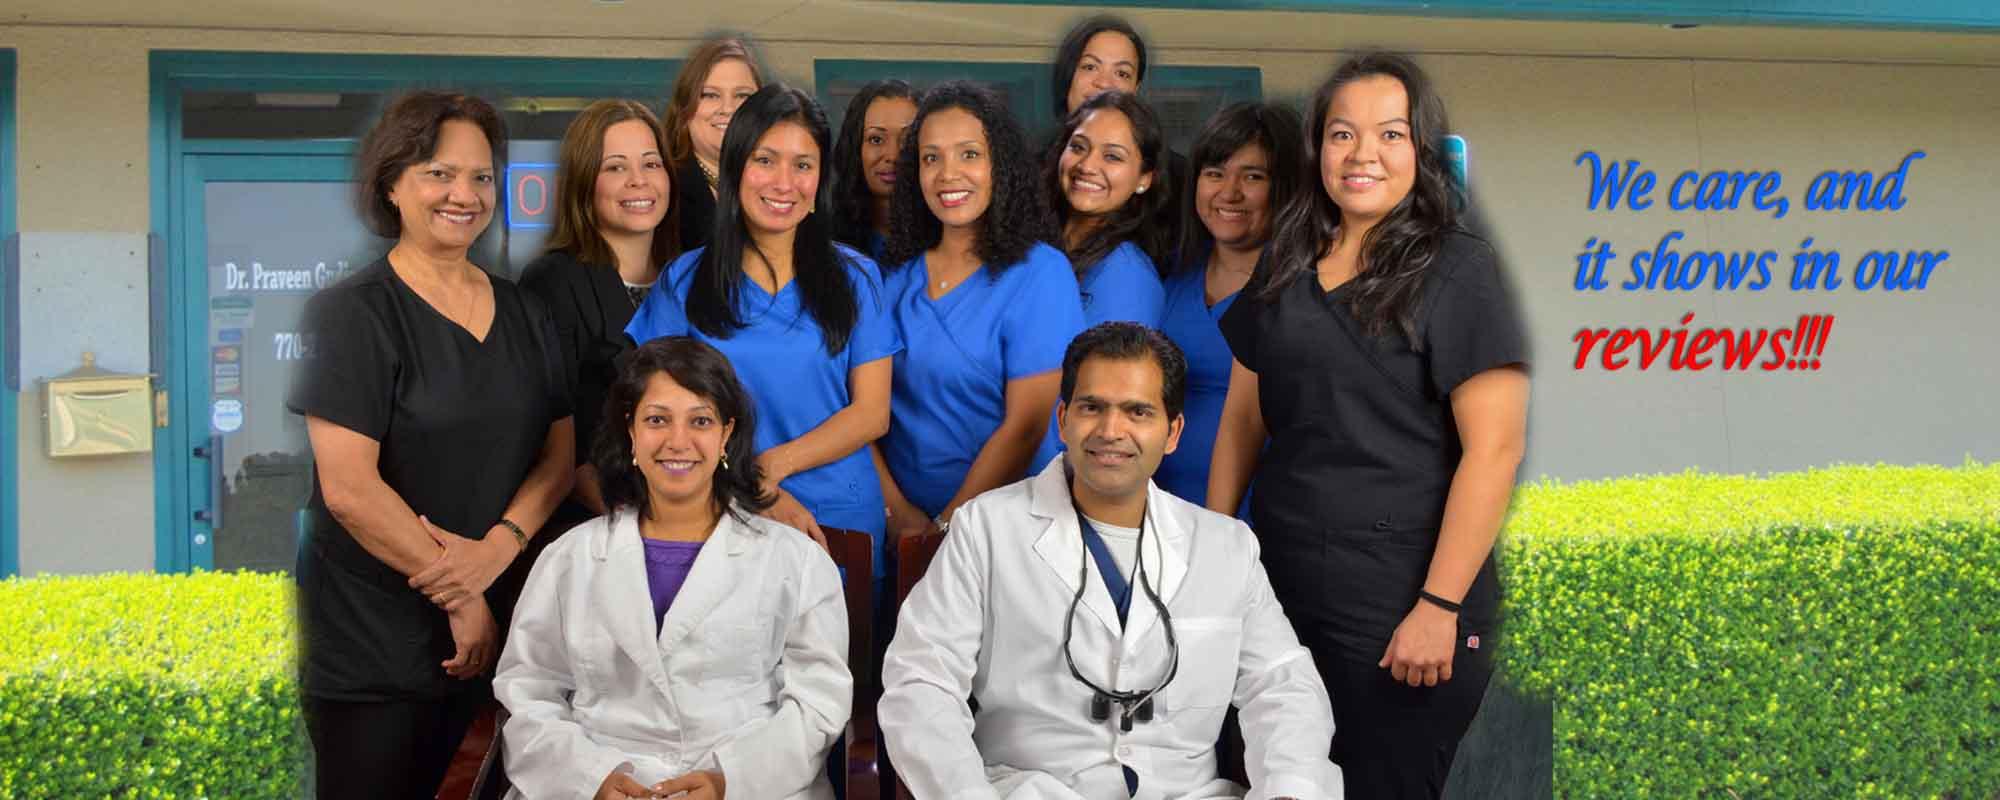 Dentist in Lawrenceville ga | Lawrenceville family dentistry